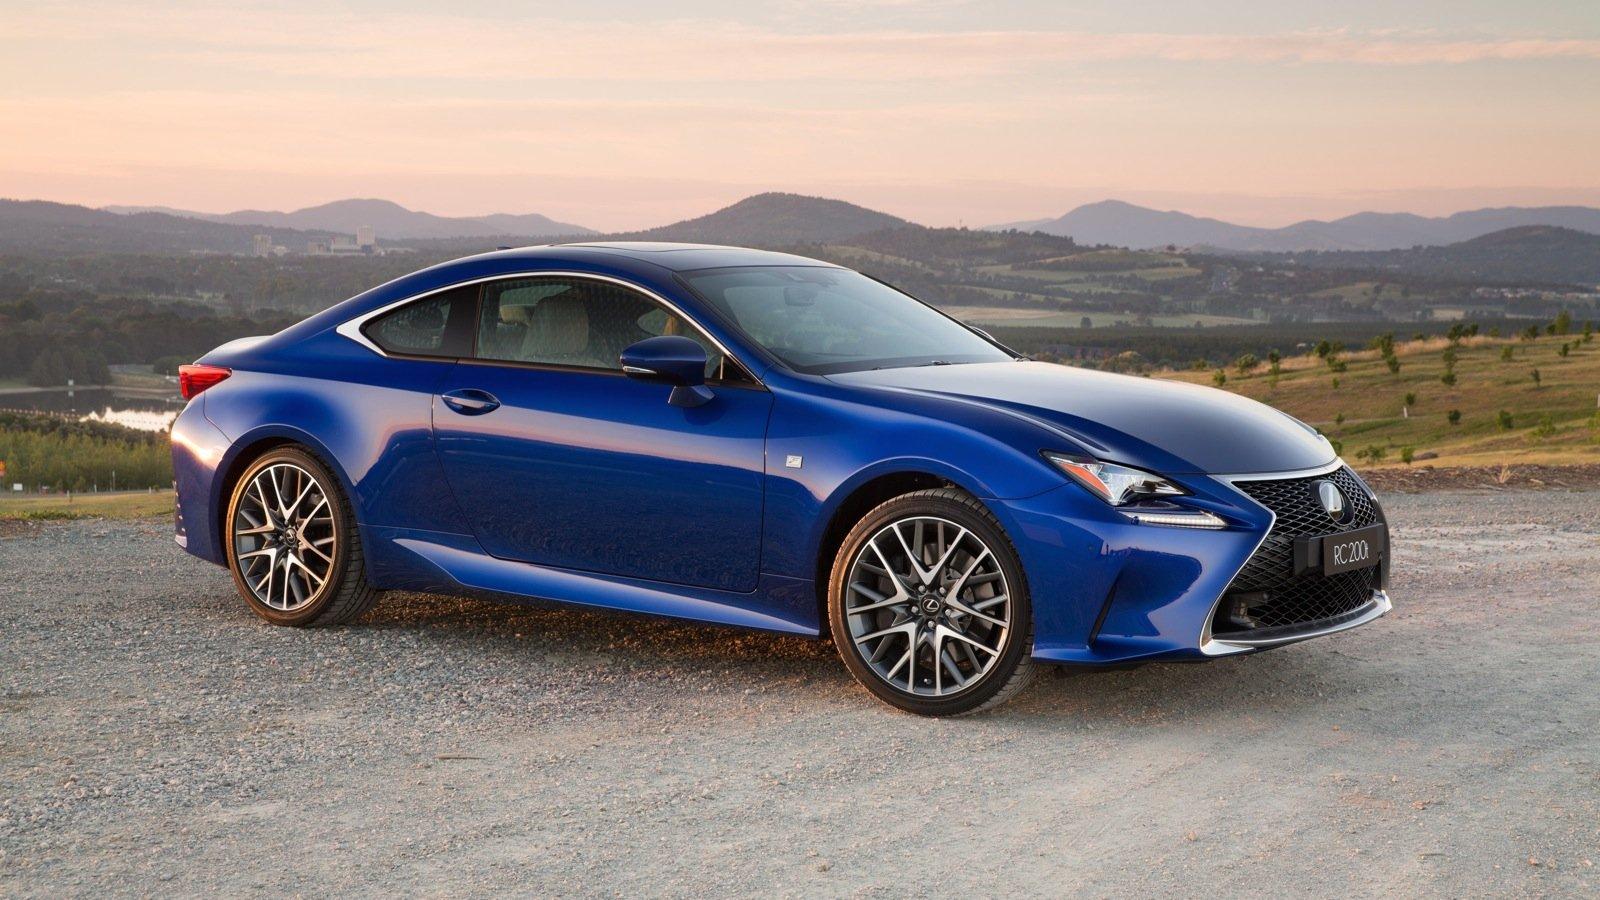 2016 Lexus Rc200t Review Caradvice